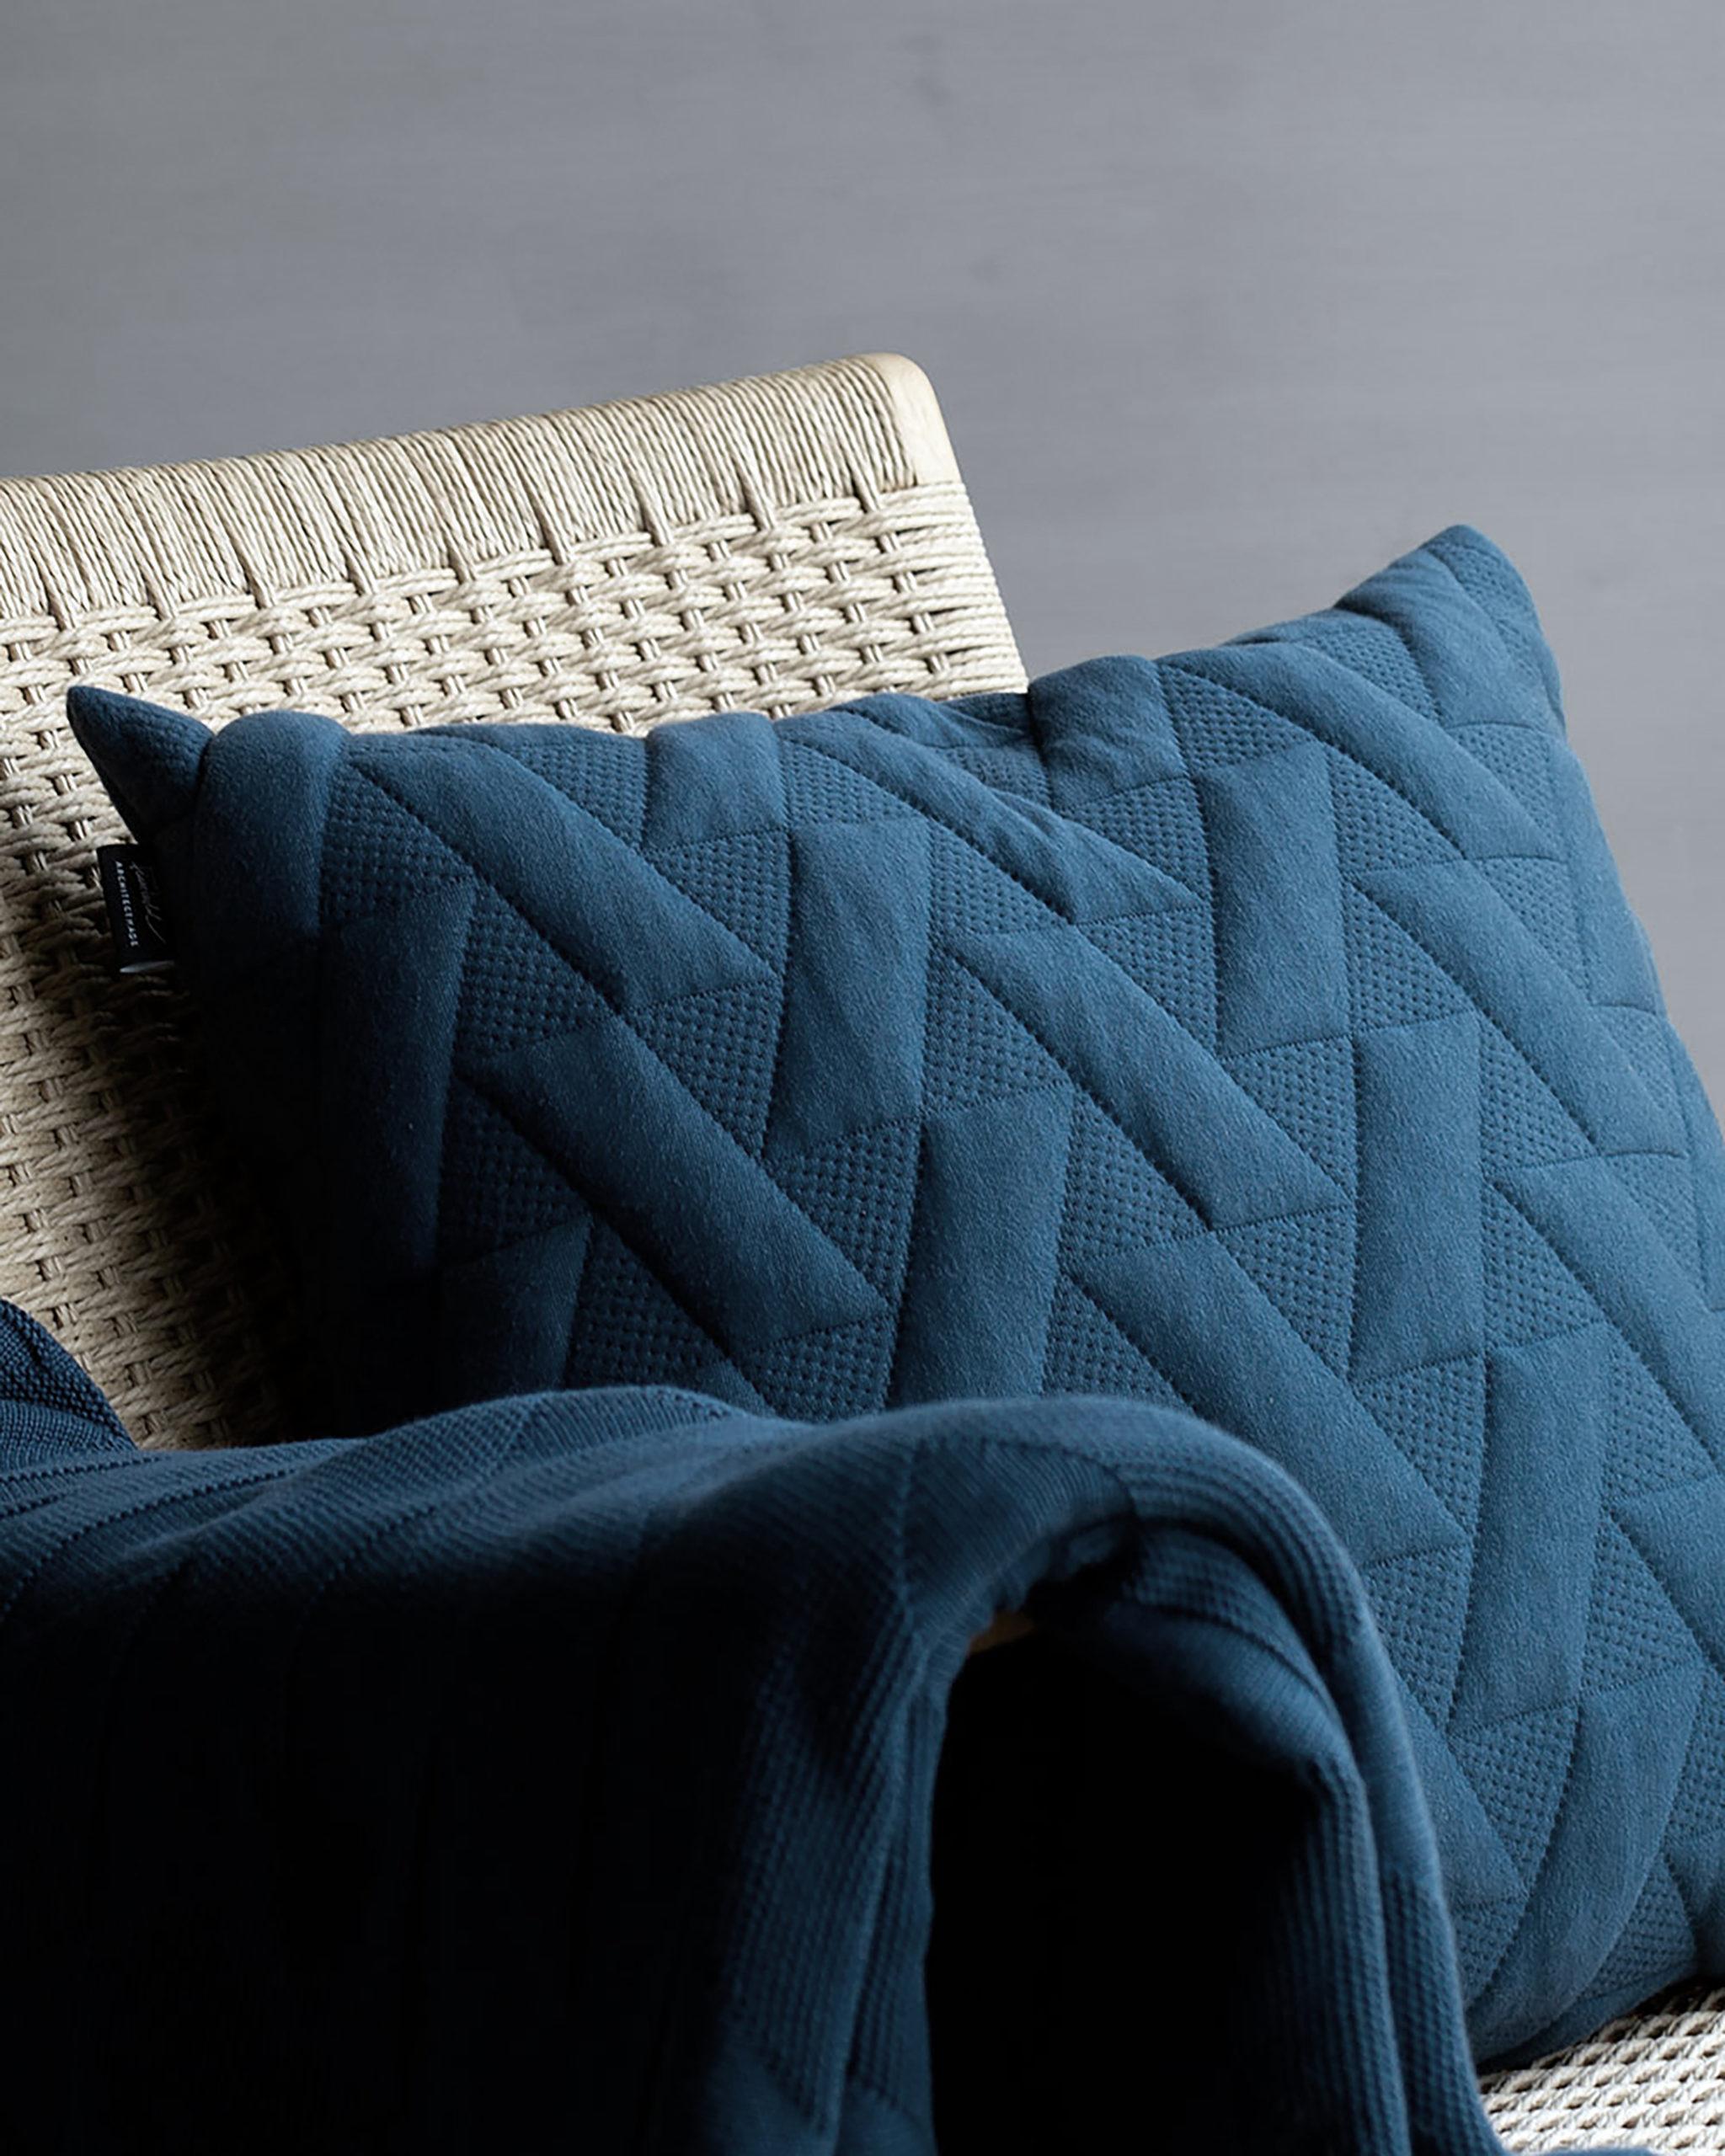 Architectmade-FJ-Pattern-Organic-Cotton-Pillows-Blankets-Denmark-Finn-Juhl-9